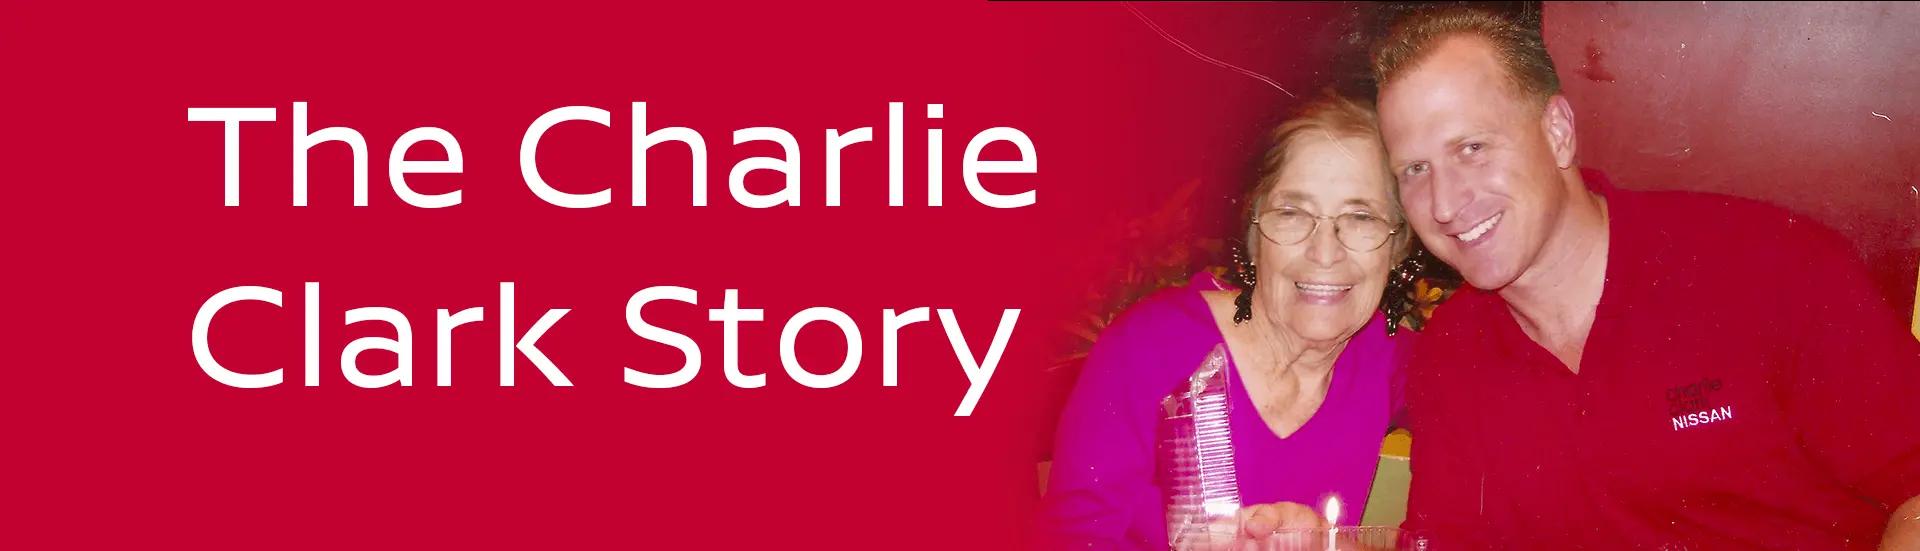 The Charlie Clark Story